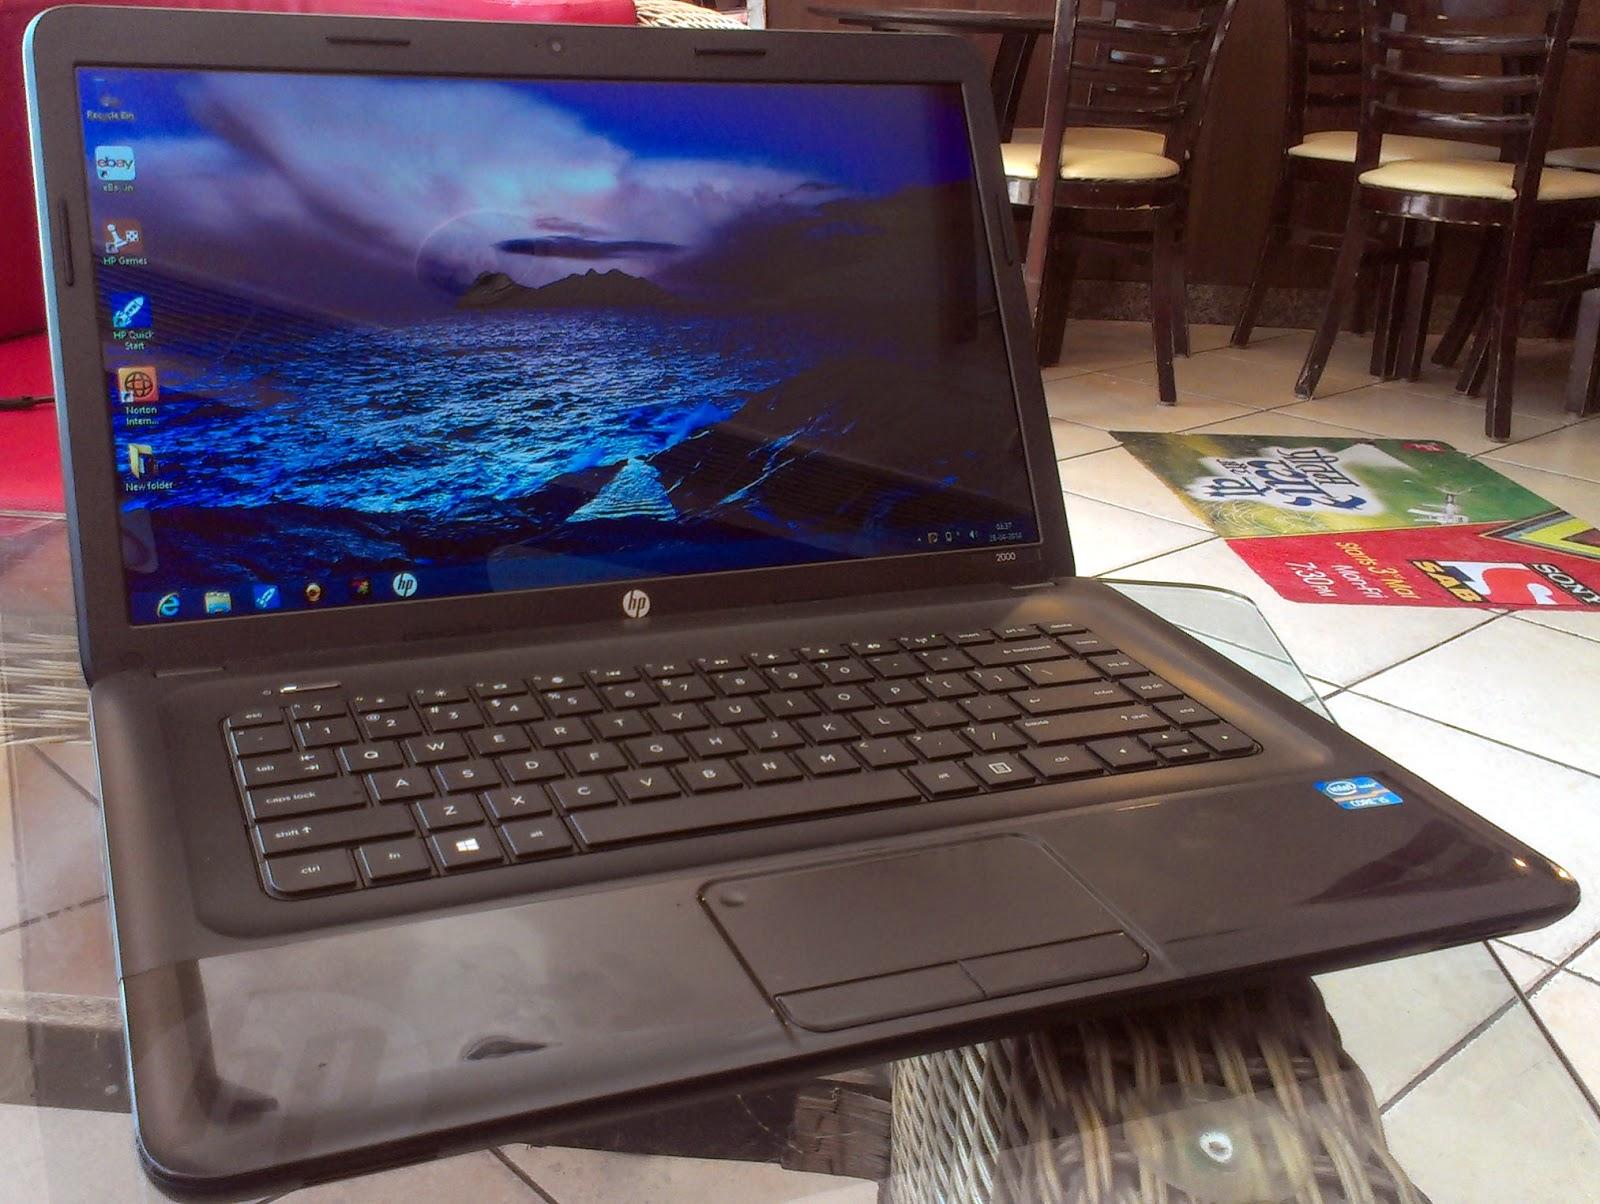 laptop-hp-2000-core-i3-ram-4gb-hdd-500gb-15